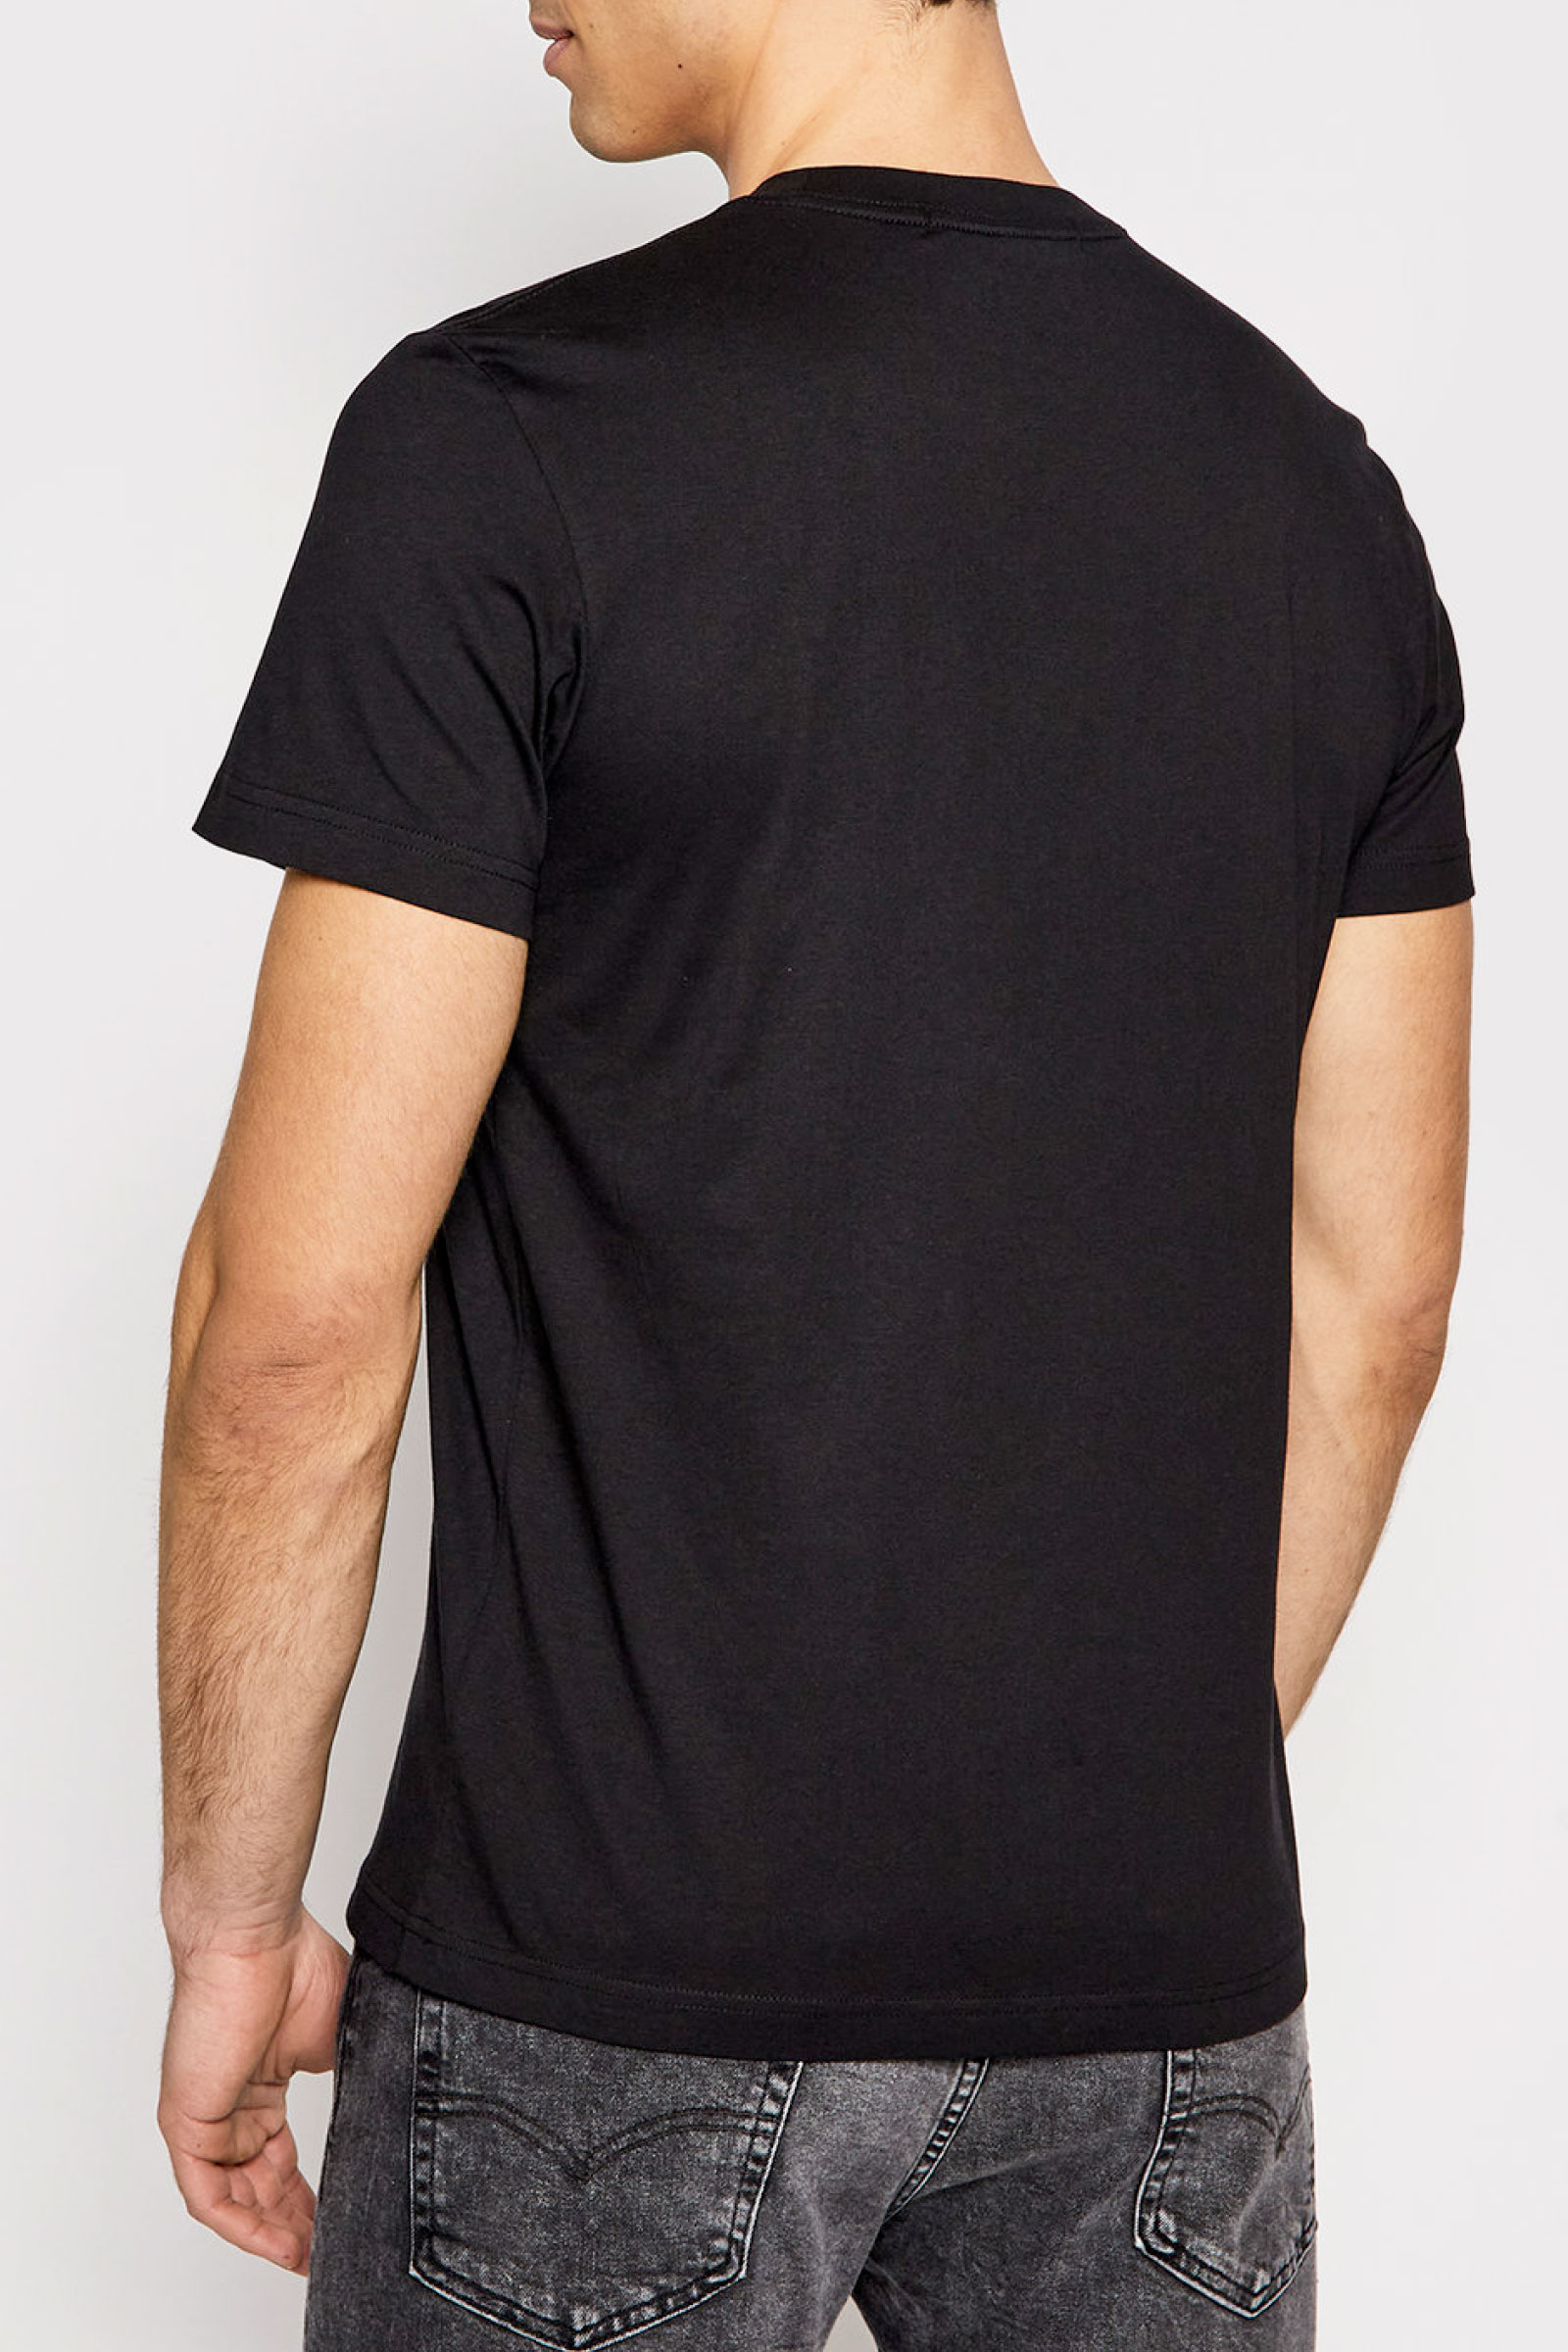 CALVIN KLEIN JEANS T-Shirt Uomo CALVIN KLEIN JEANS | T-Shirt | J30J317448BEH